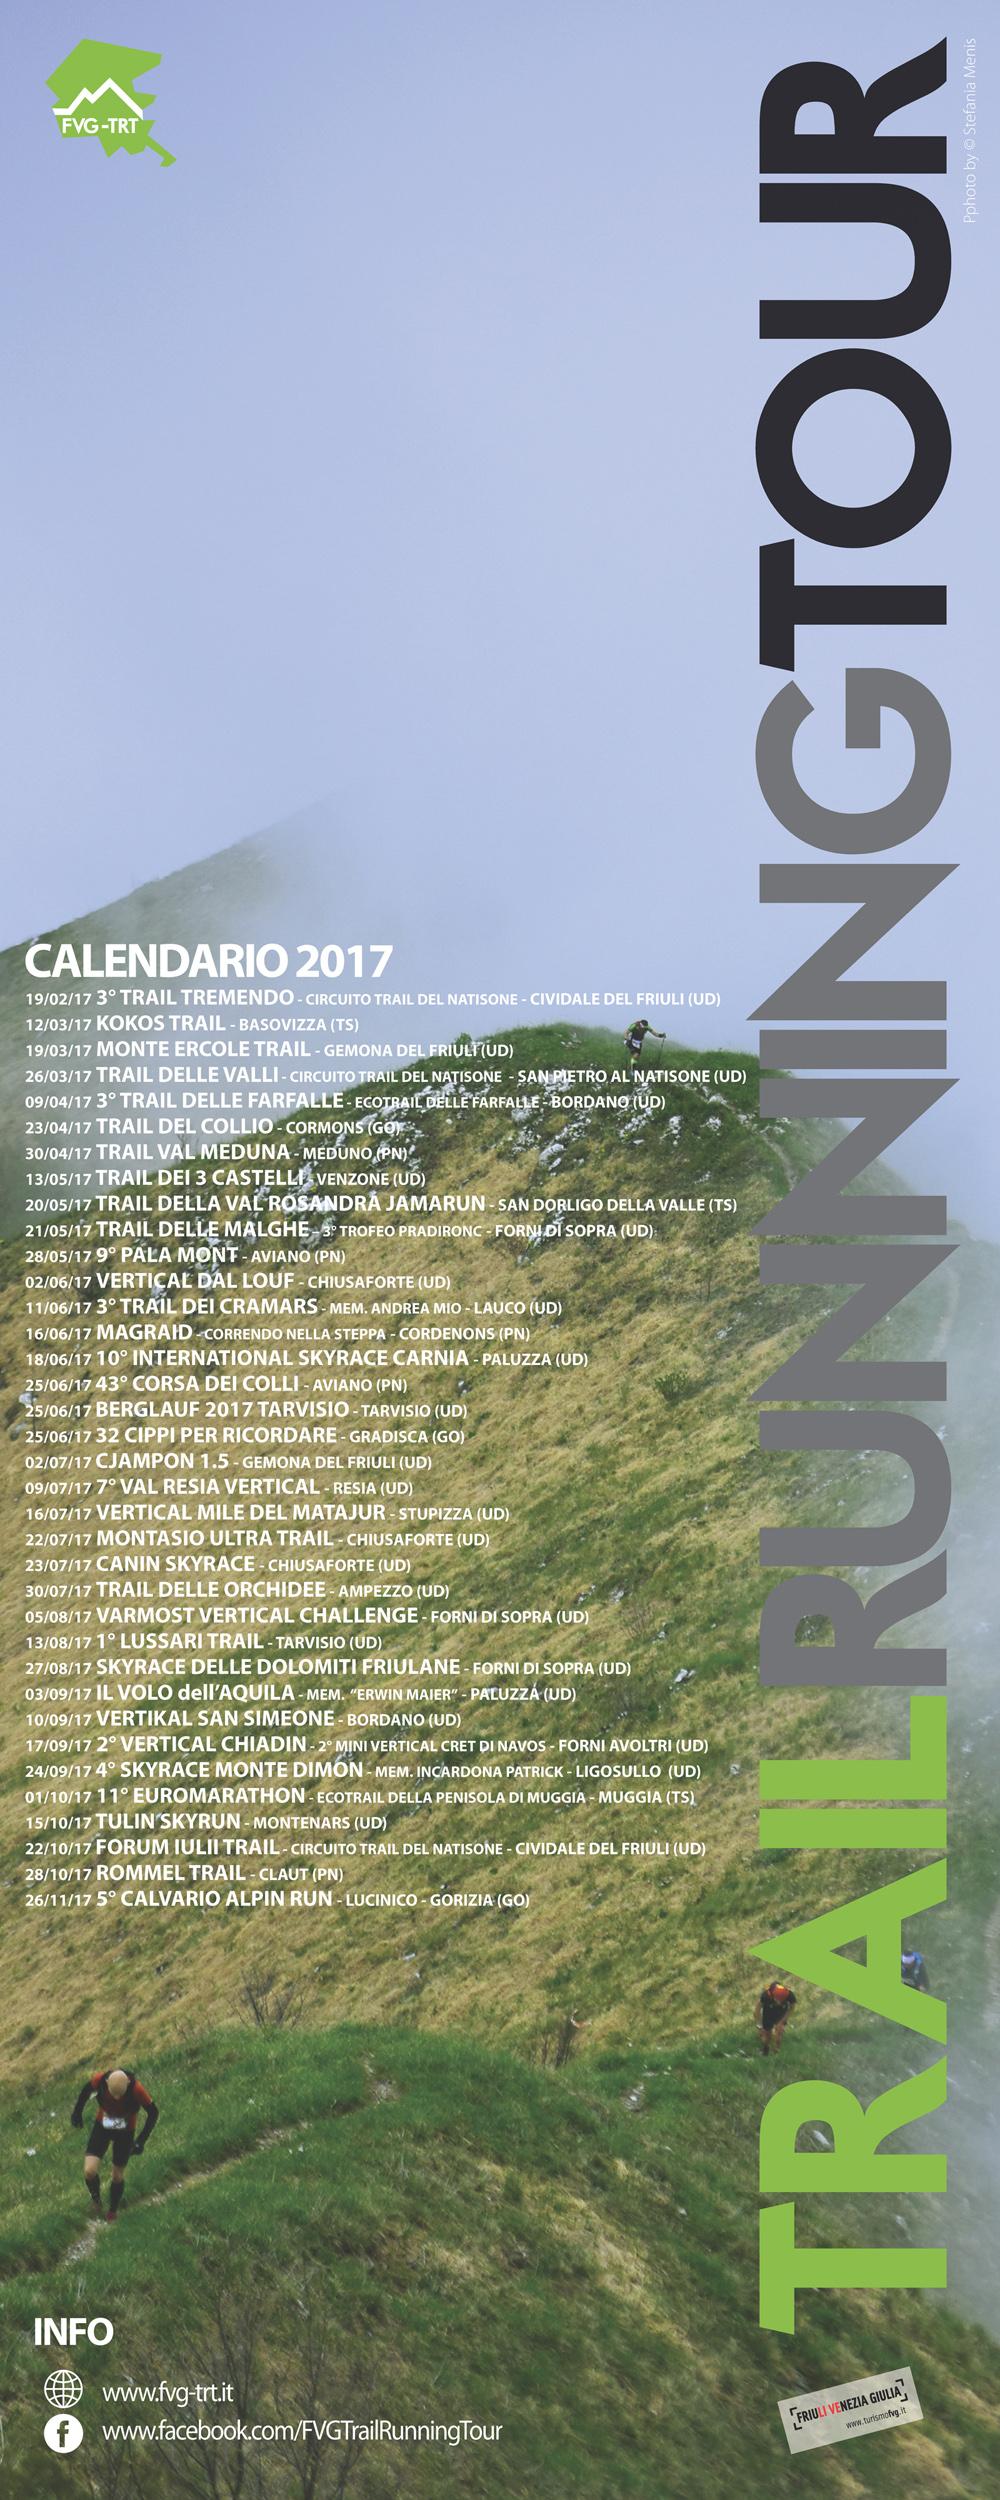 Calendario Running.Calendario Fvg Trail Running Tour 2017 Running Tour